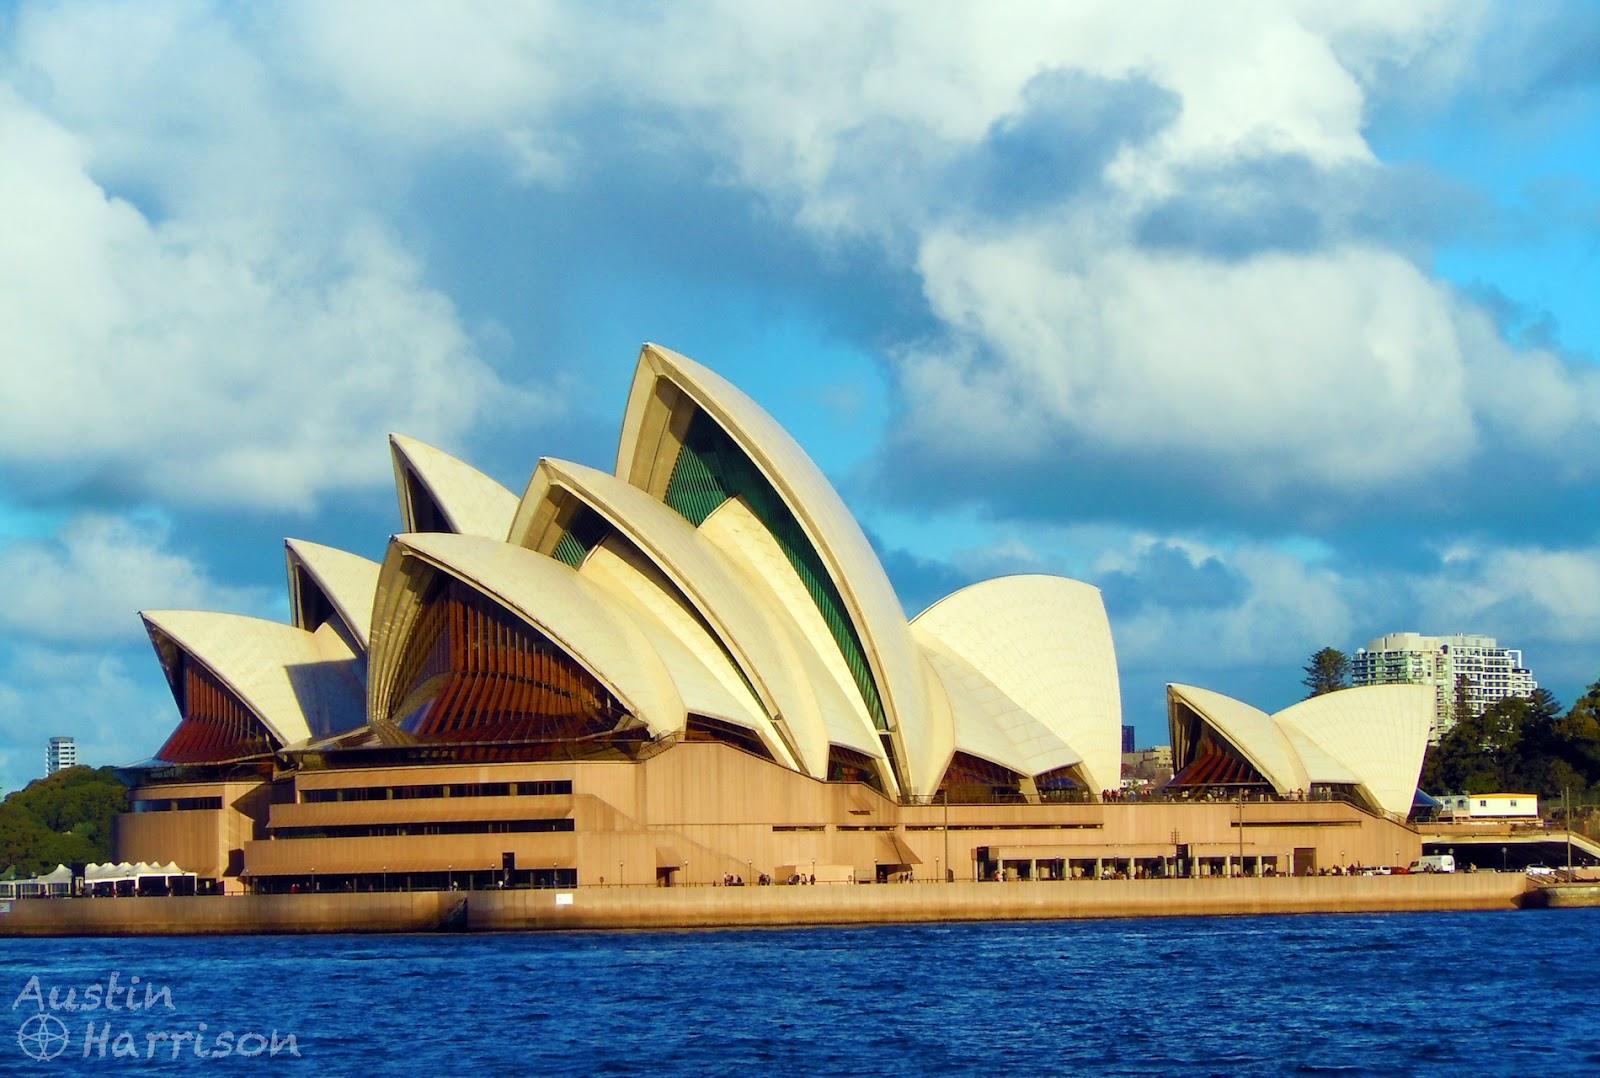 Sydney+Opera+house - 46+ Photos Of Sydney Opera House In Australia  Pictures